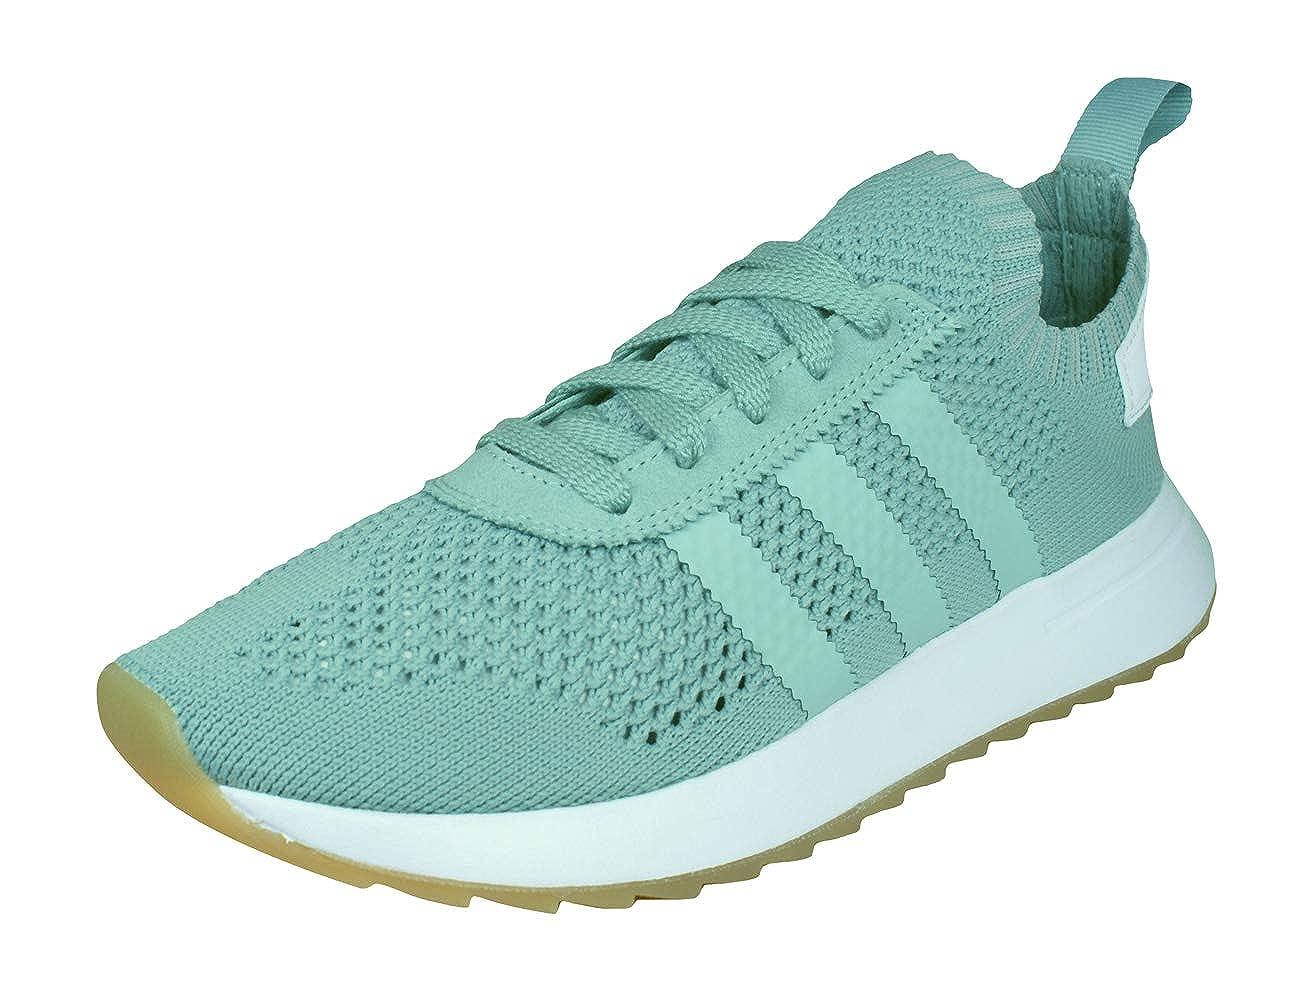 Adidas Damen FLB W Pk Fitnessschuhe türkis